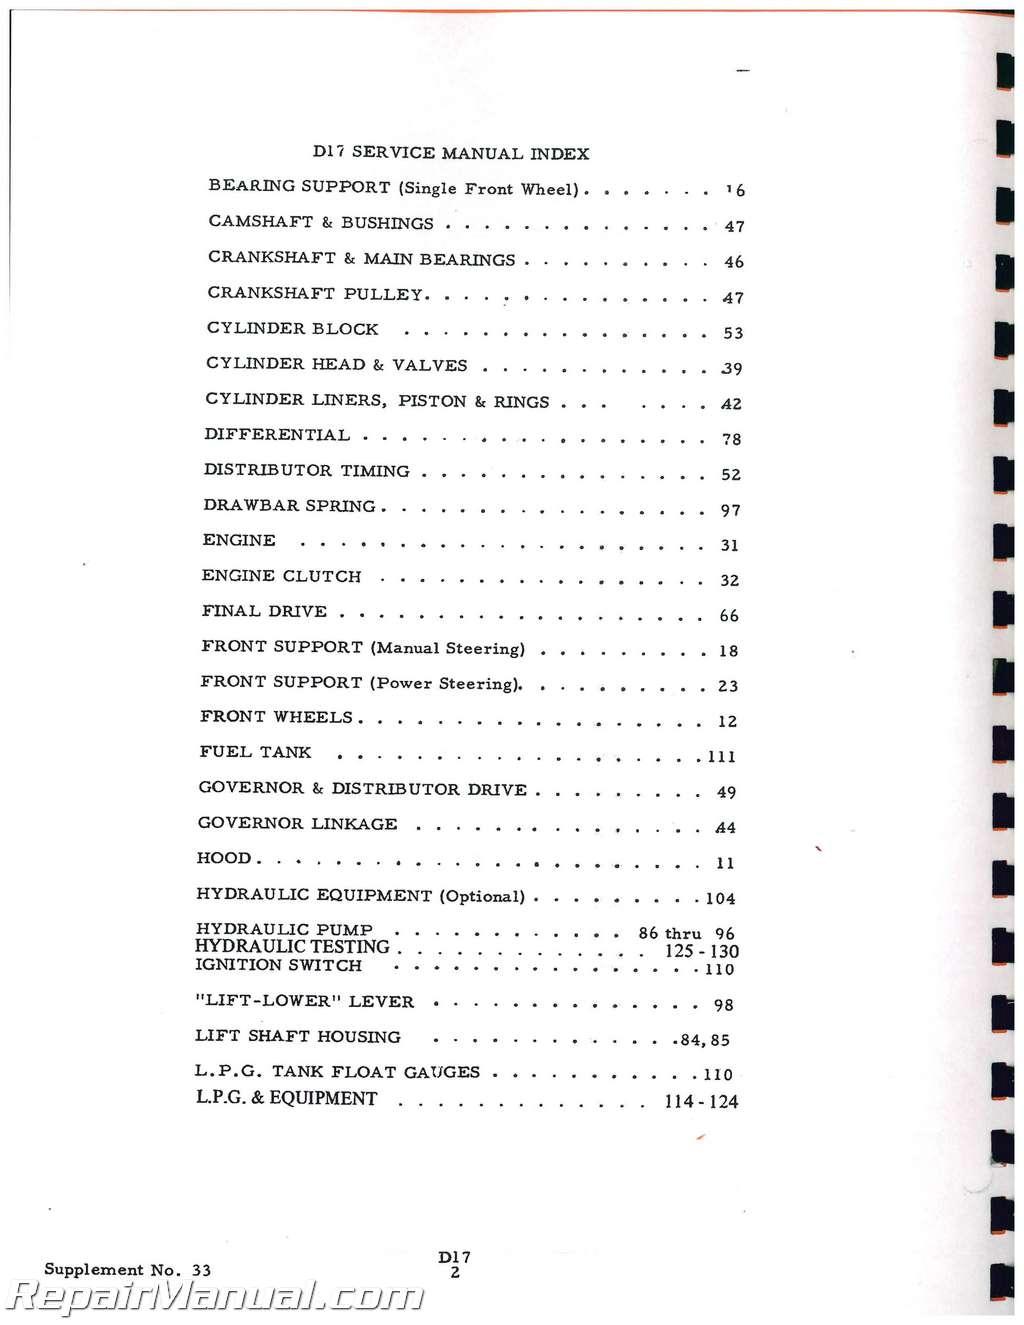 Allis chalmers d17 Free Manual